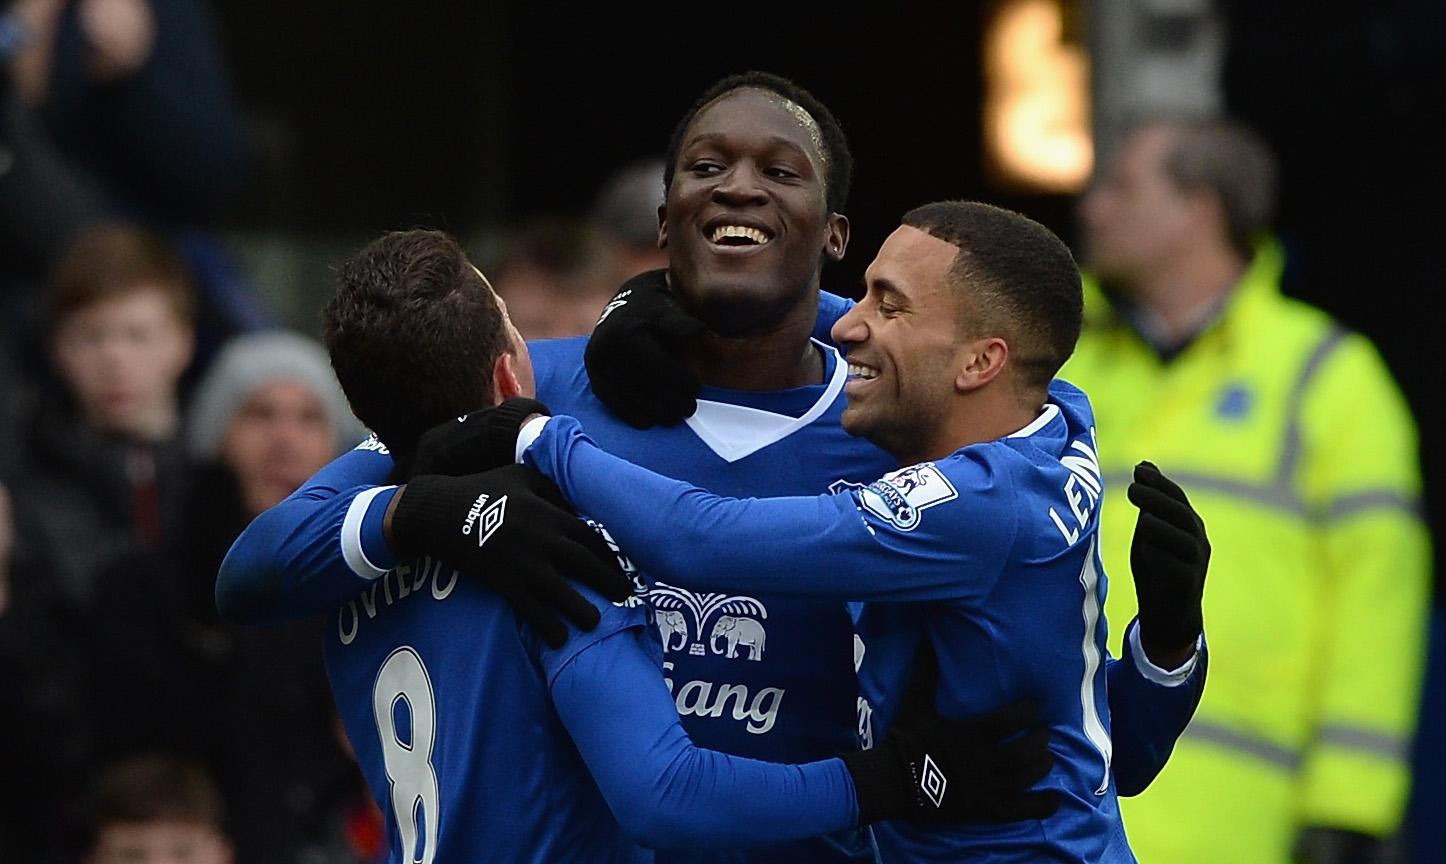 Everton owner Farhad Moshiri must secure Romelu Lukaku's long-term future